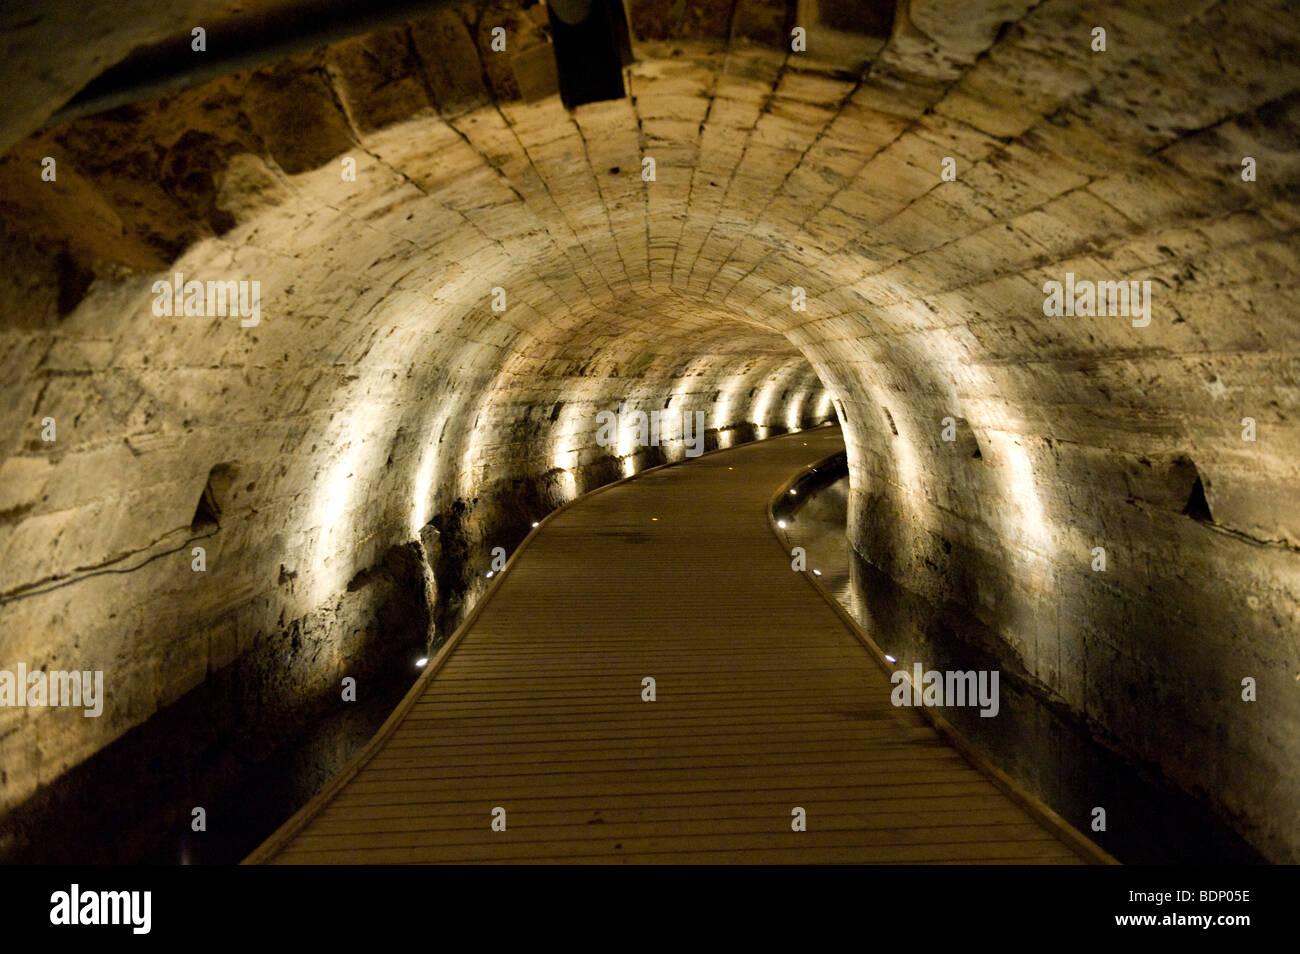 Tunnel of the knights templar in Akko. - Stock Image